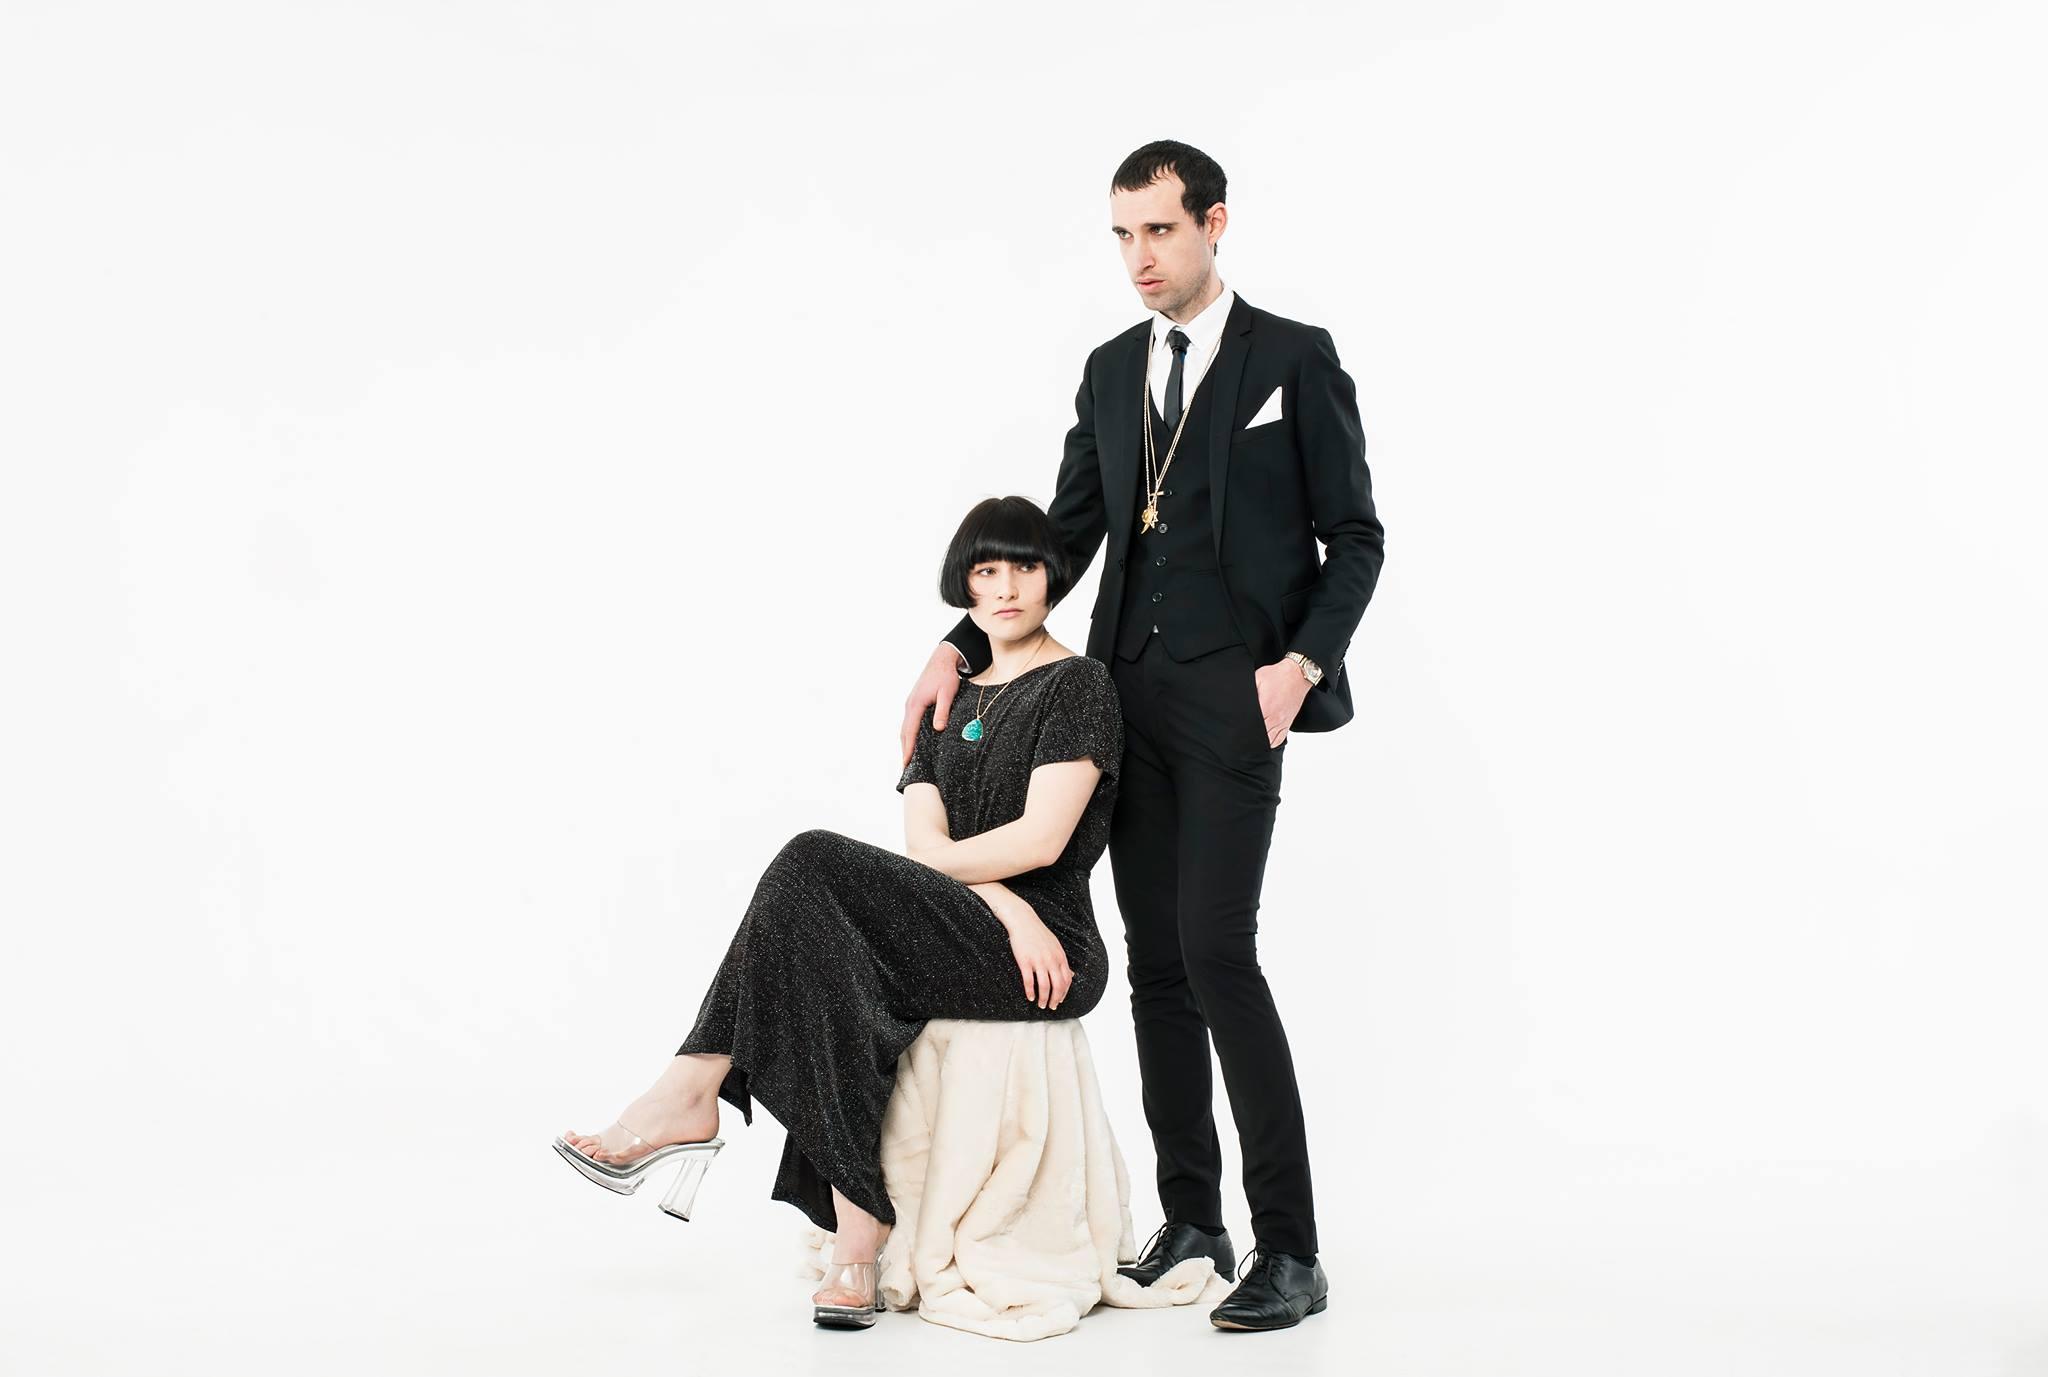 Jimi Kritzler and Tara Green as White Hex